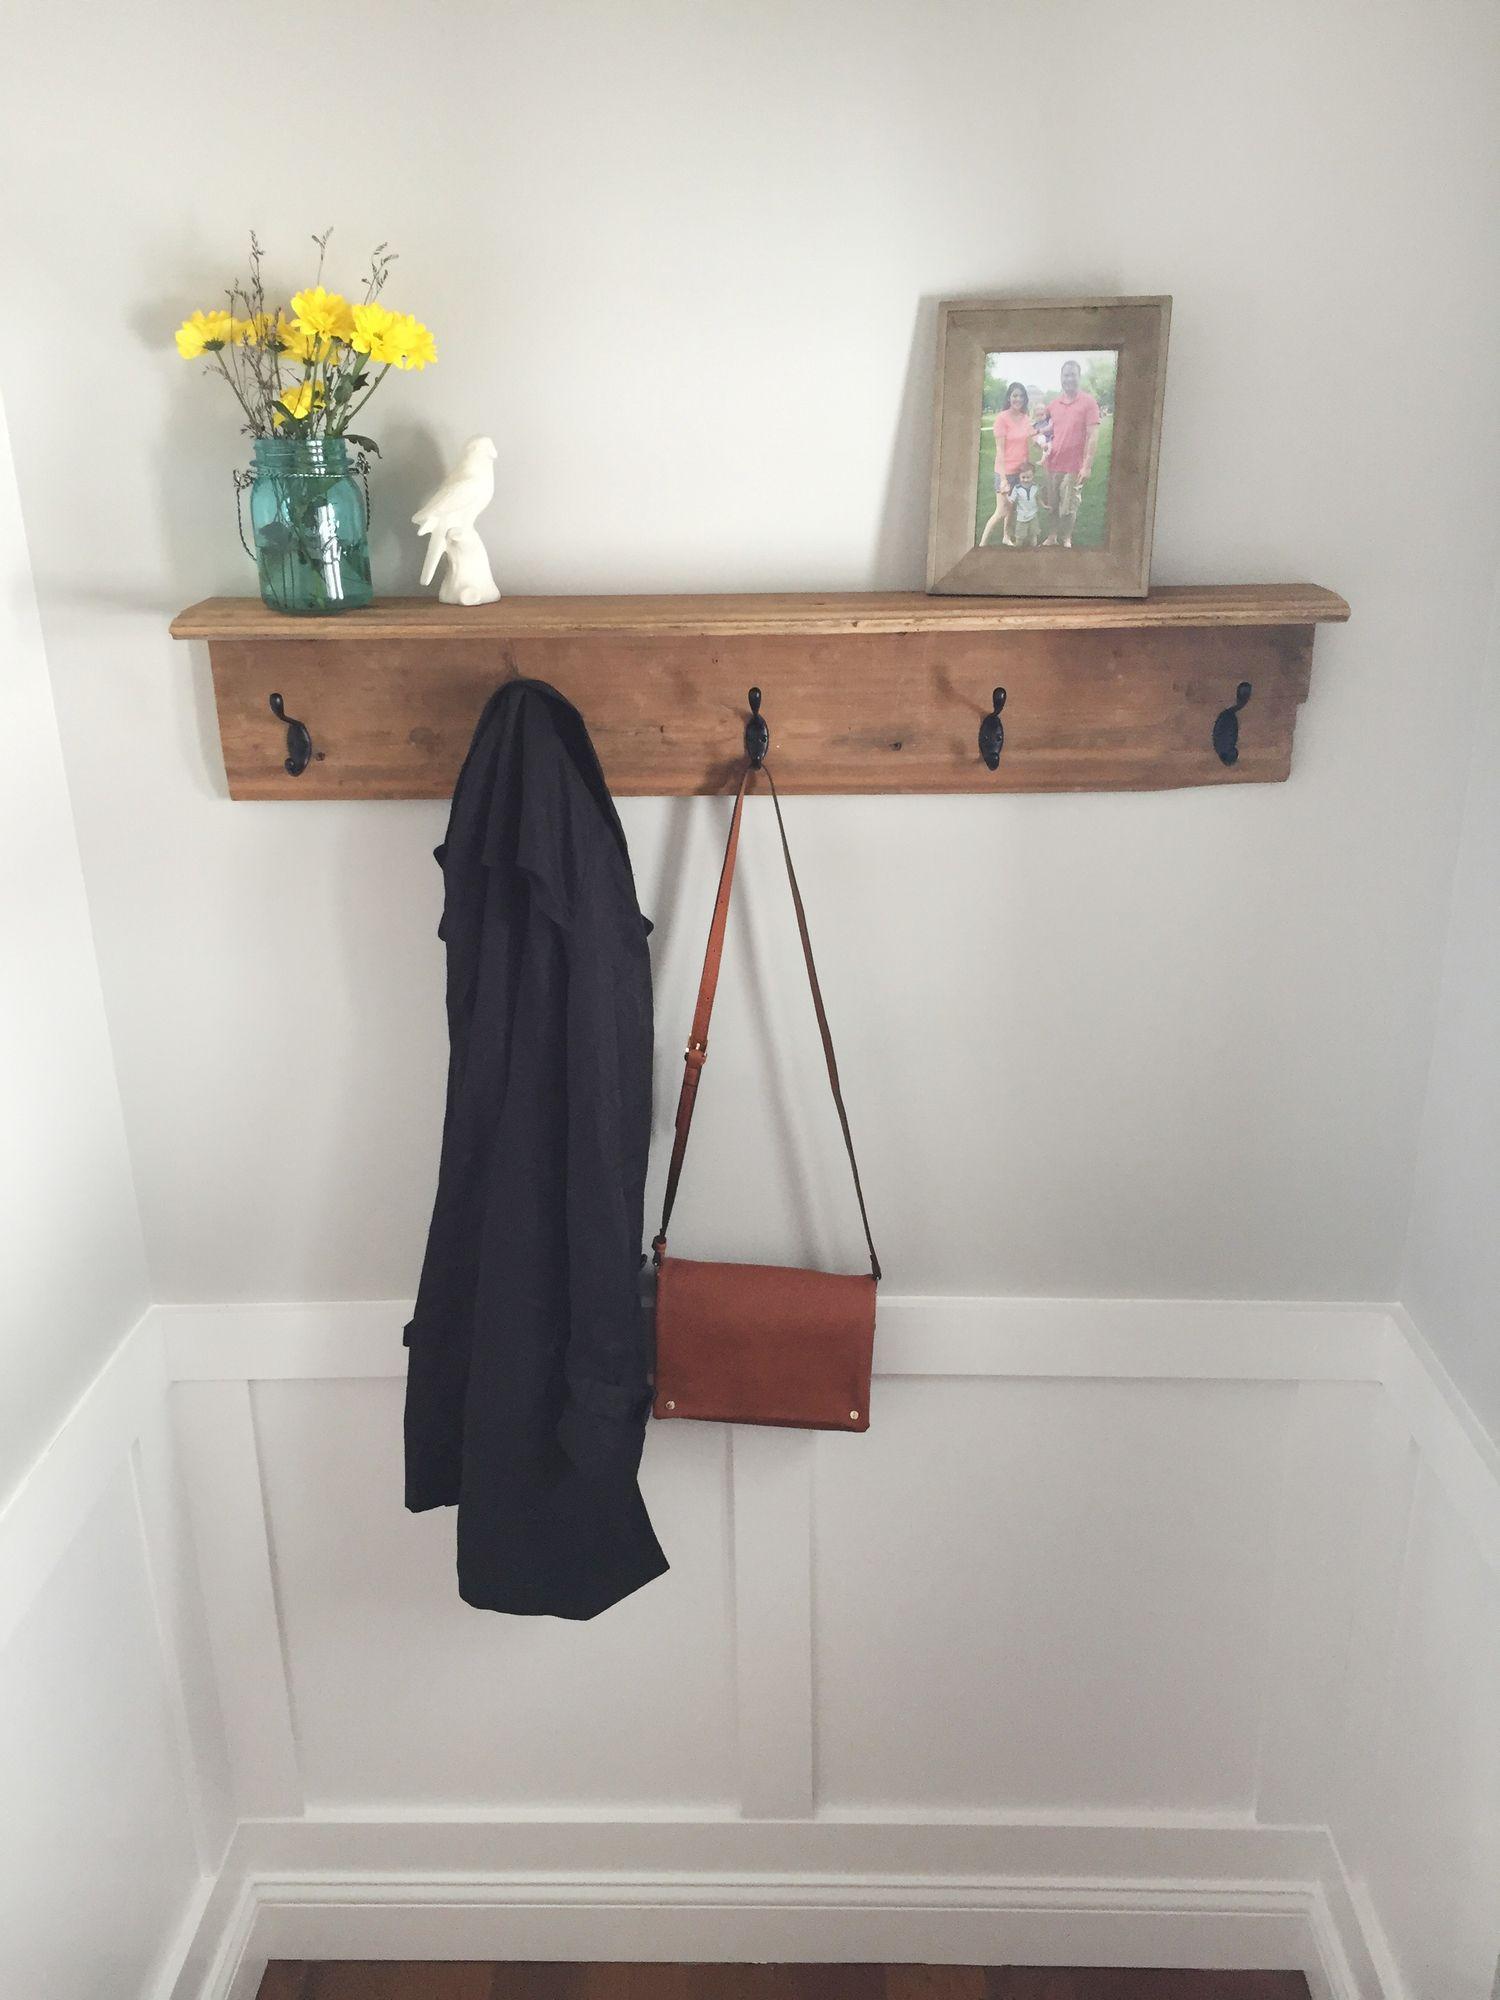 How To Build A Farmhouse Coat Rack Coat Rack Wall Entryway Diy